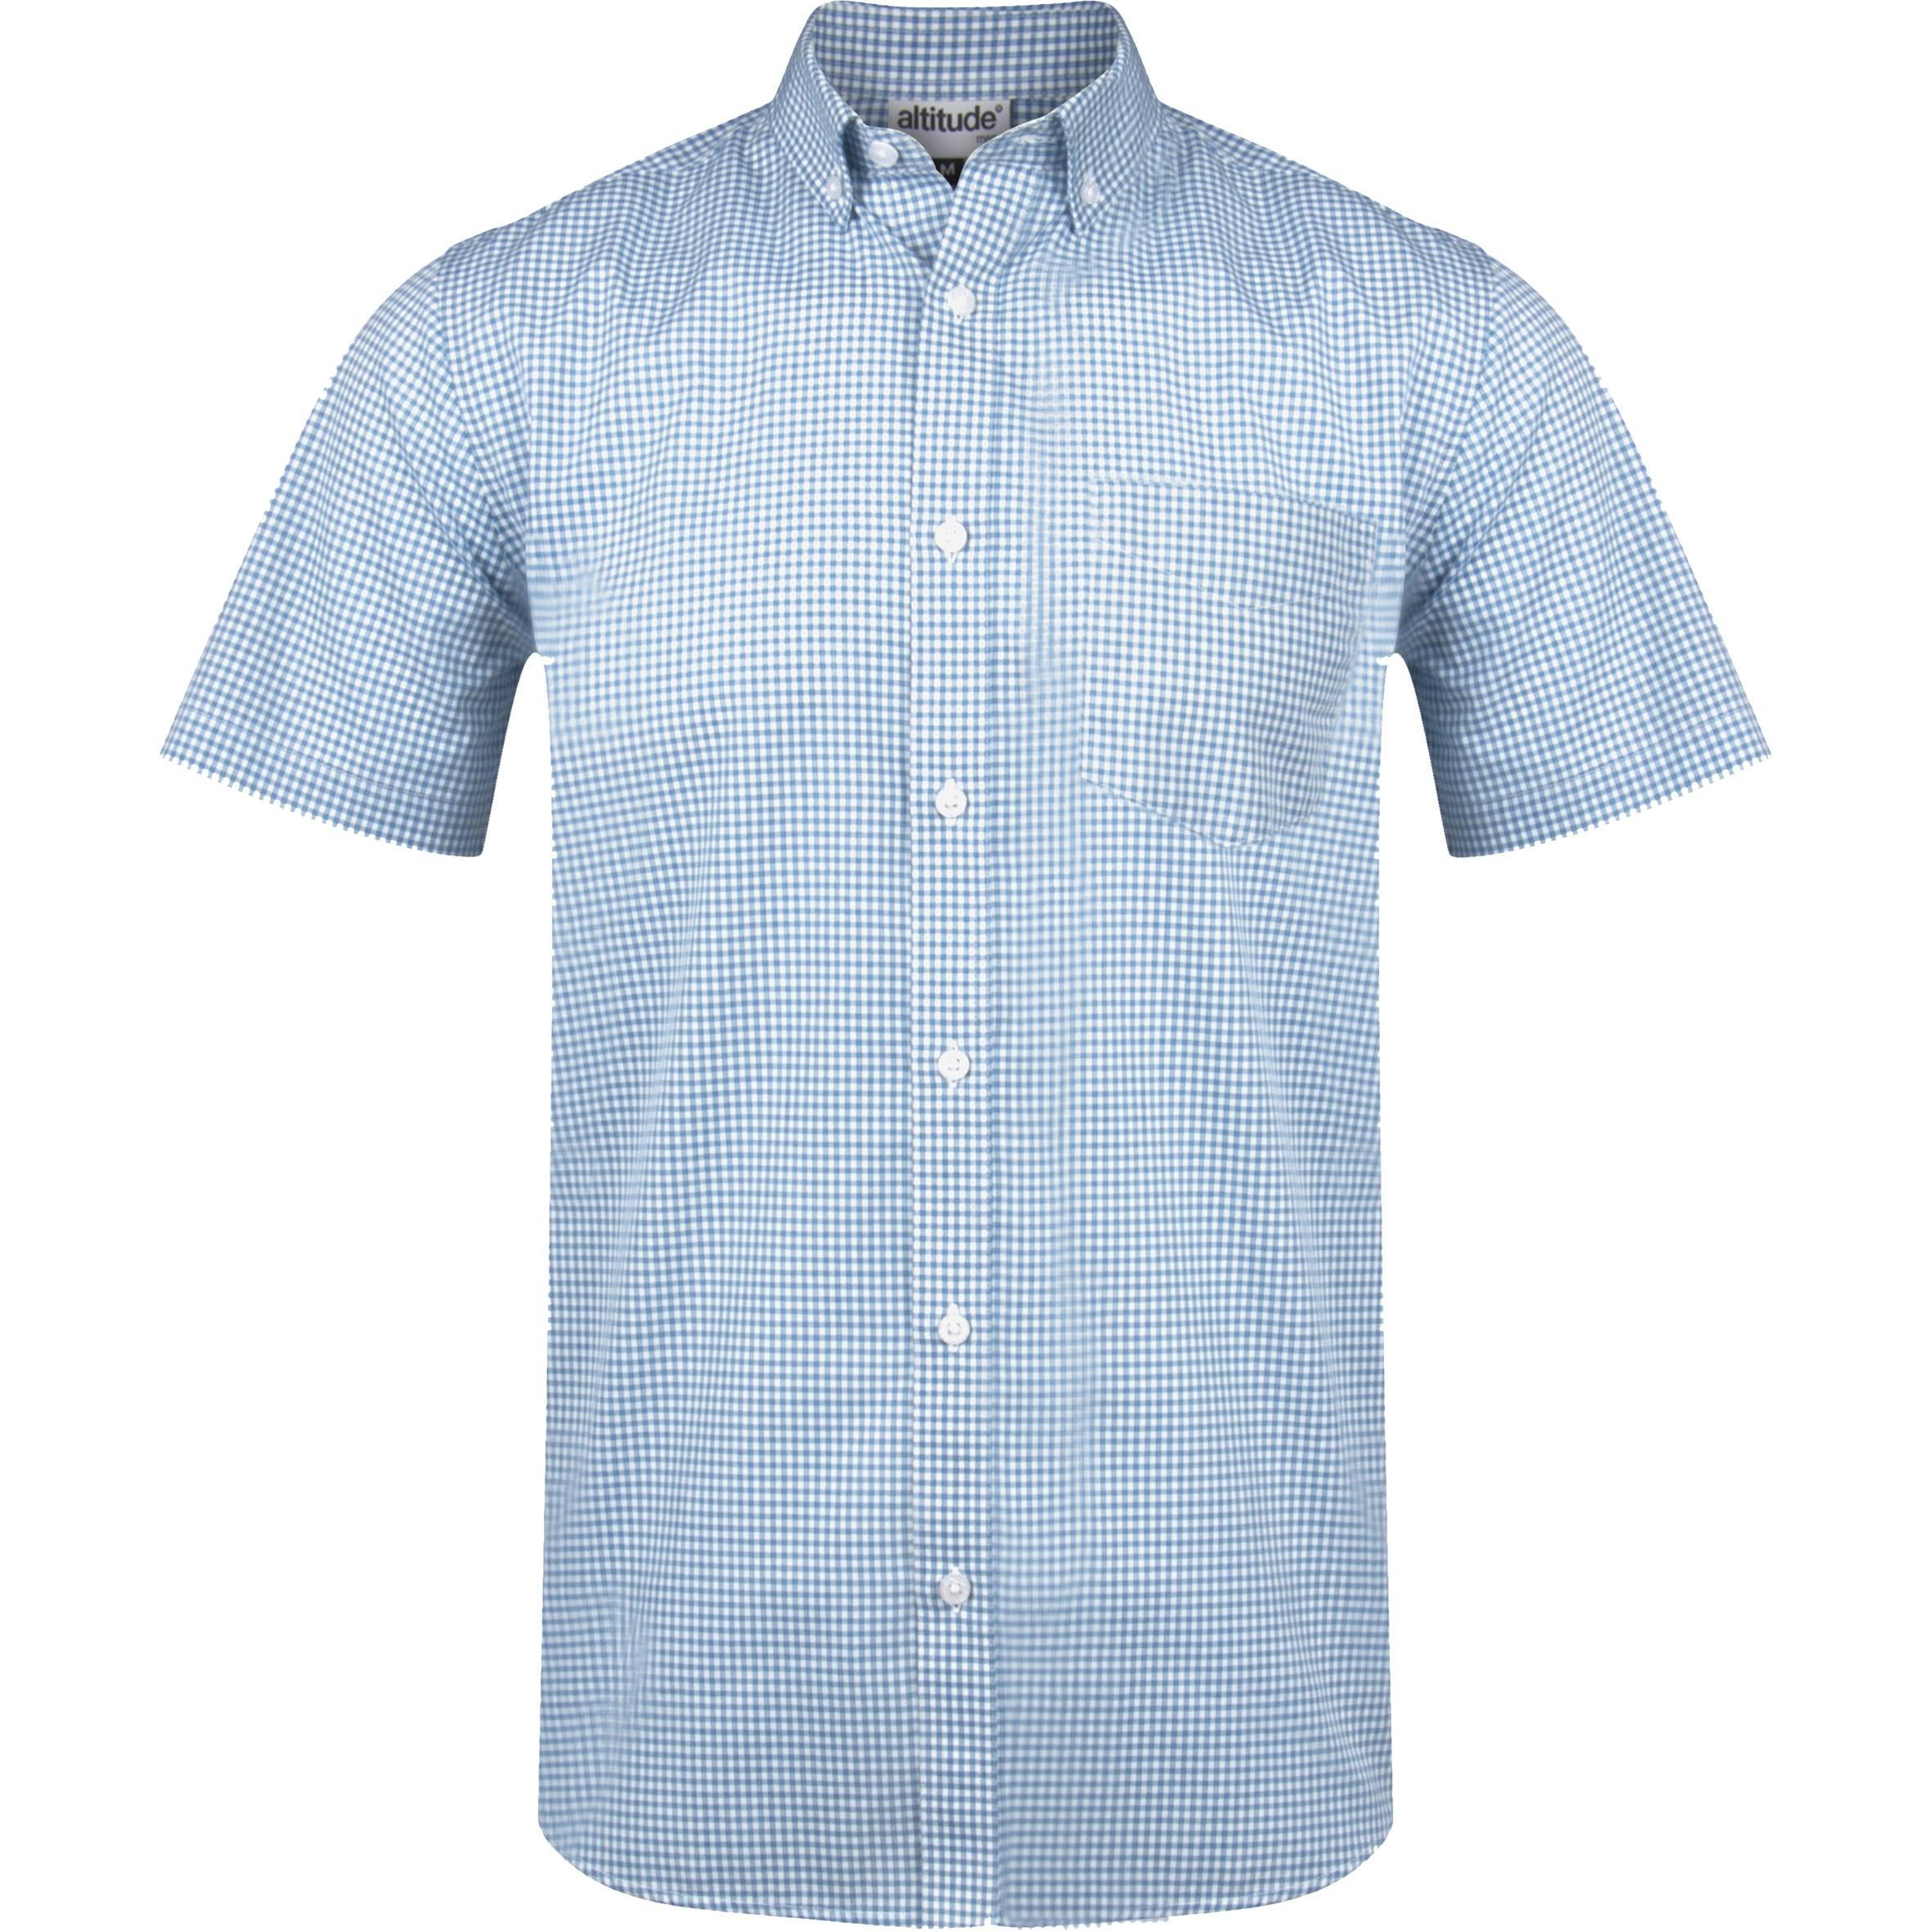 Mens Short Sleeve Edinburgh Shirt - Blue Only